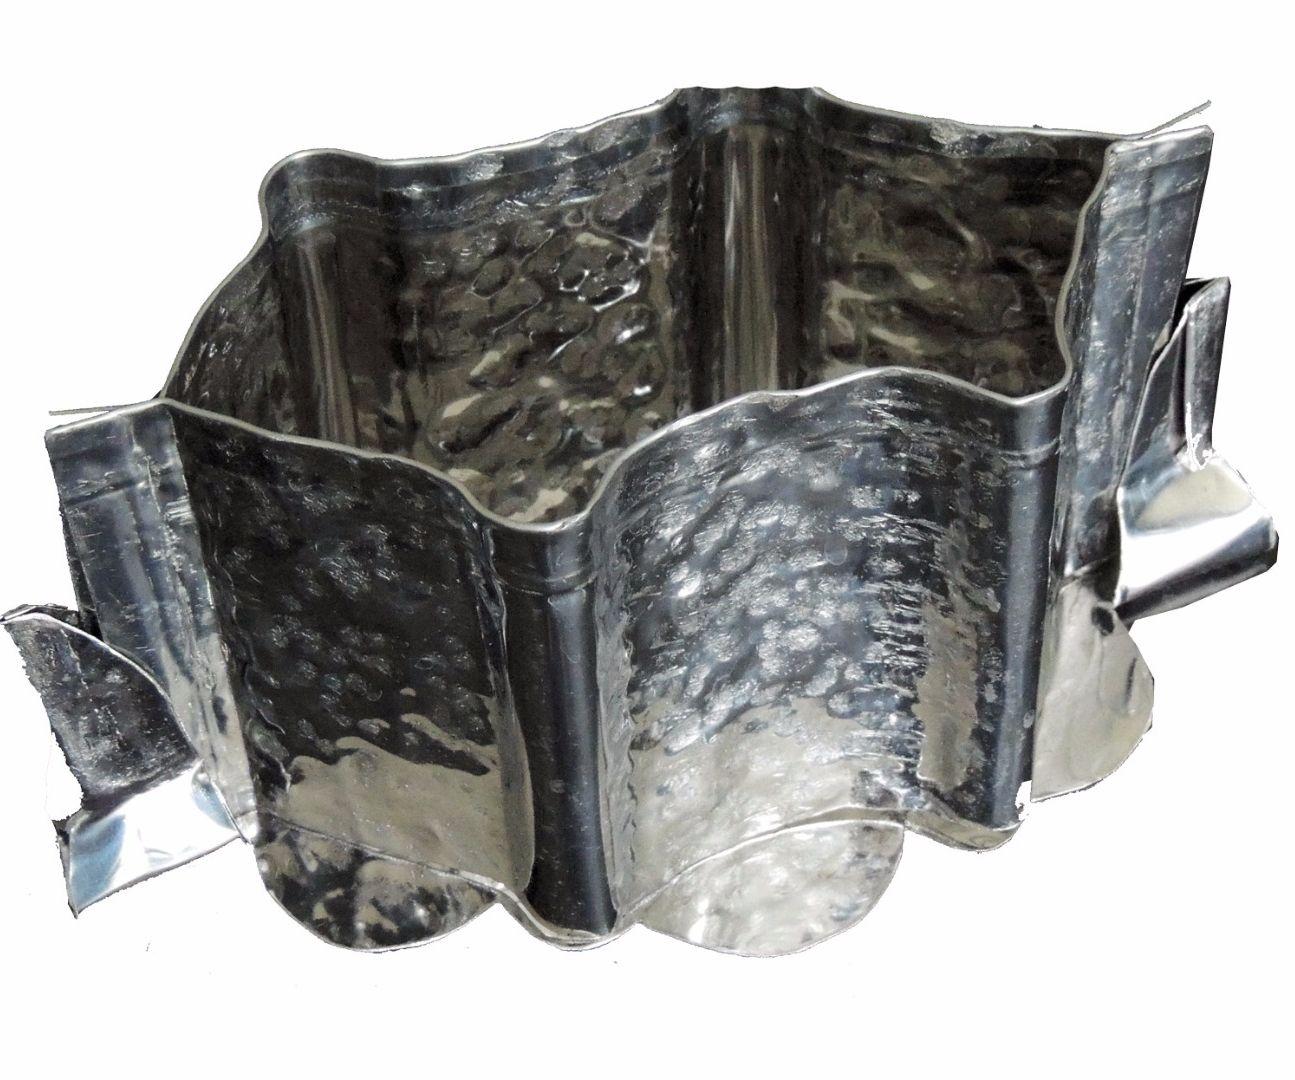 Making a raised pork pie mould by recycling a stainless steel IKEA bin